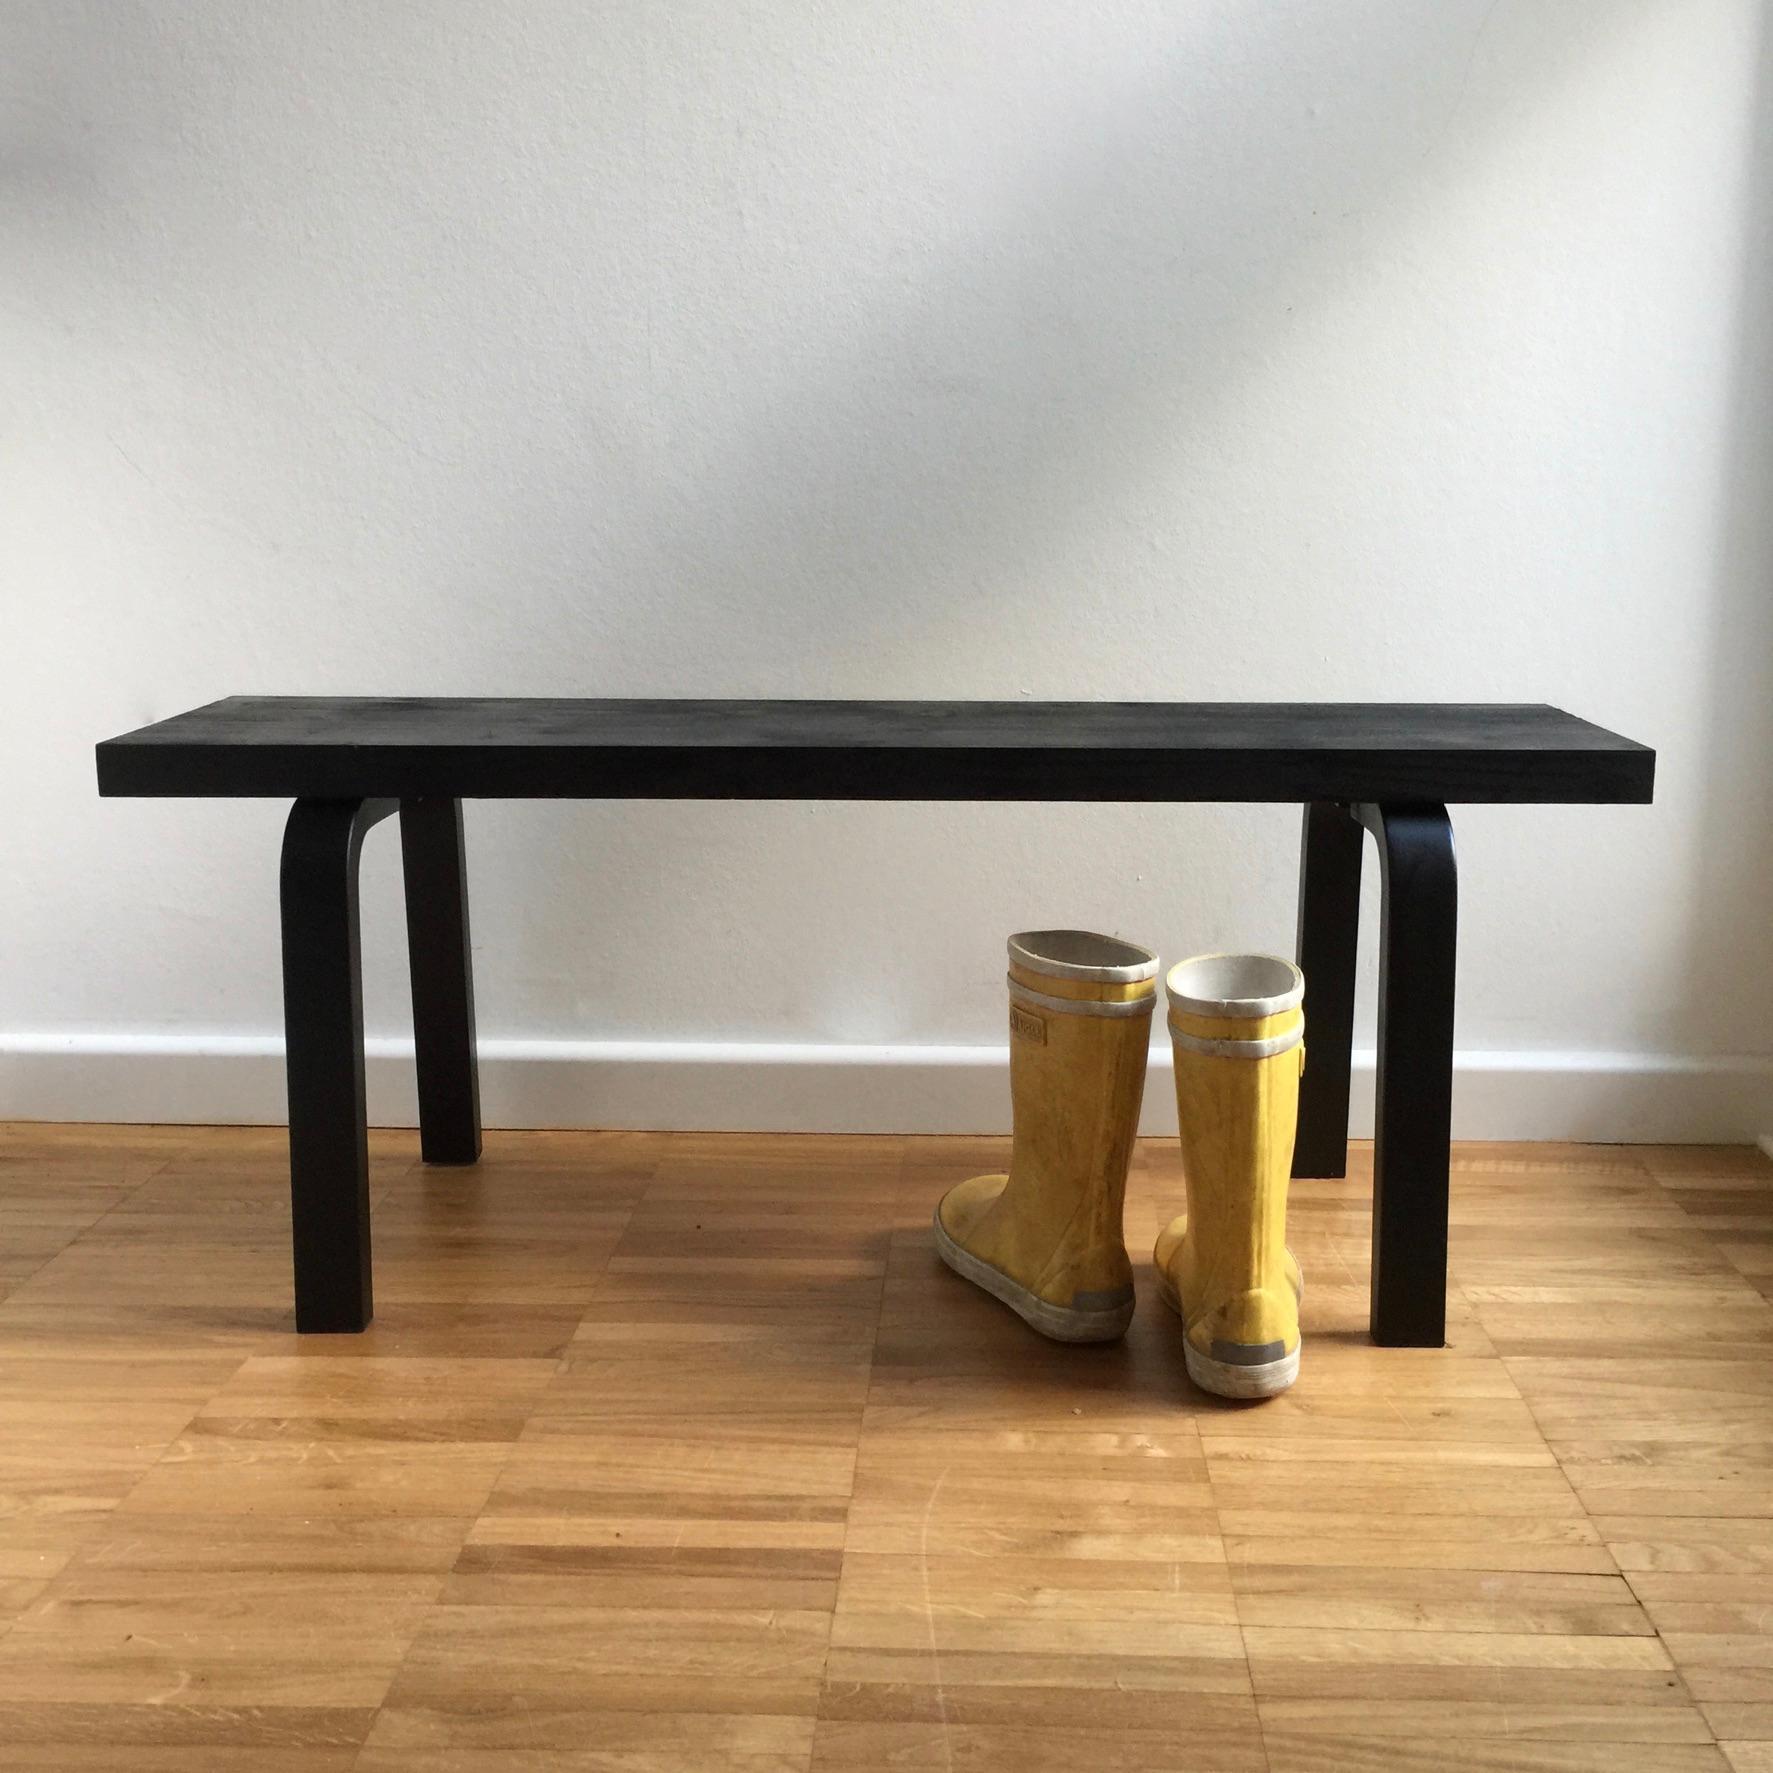 garderobe bilder ideen couchstyle. Black Bedroom Furniture Sets. Home Design Ideas